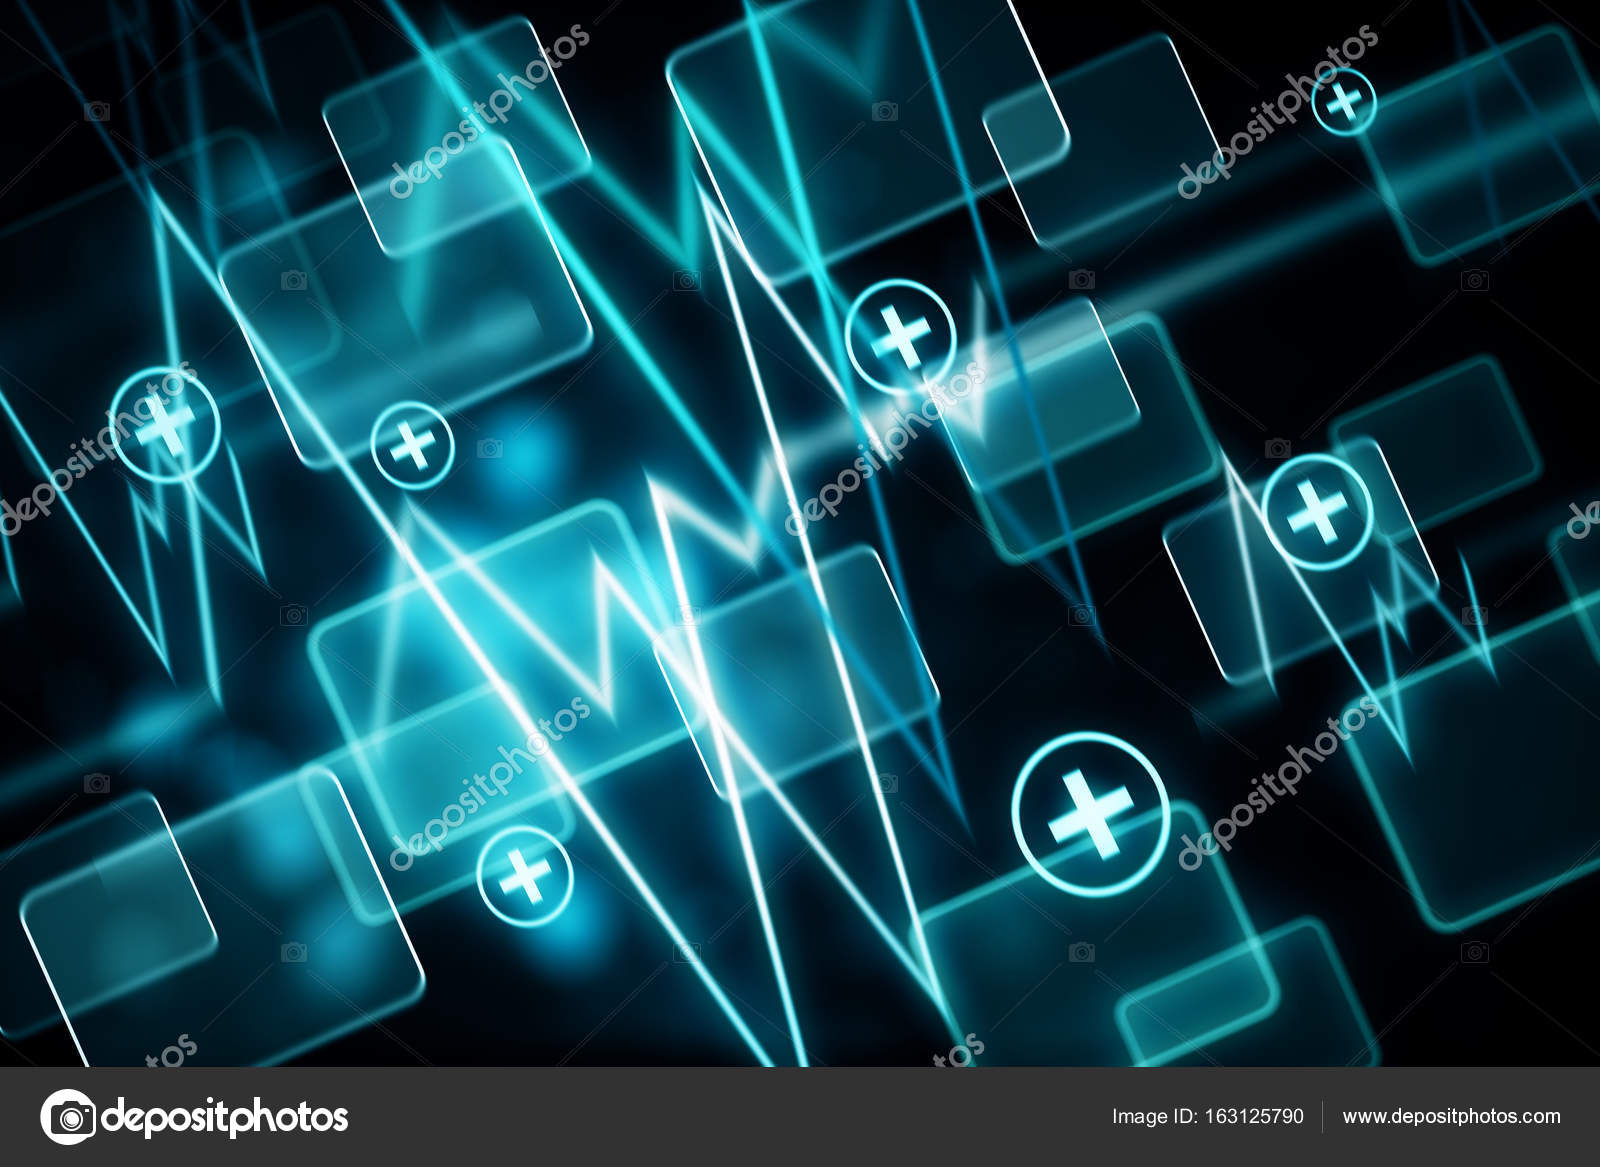 Cool Background Wallpapers 3d 3d Medical Wallpaper Www Pixshark Com Images Galleries